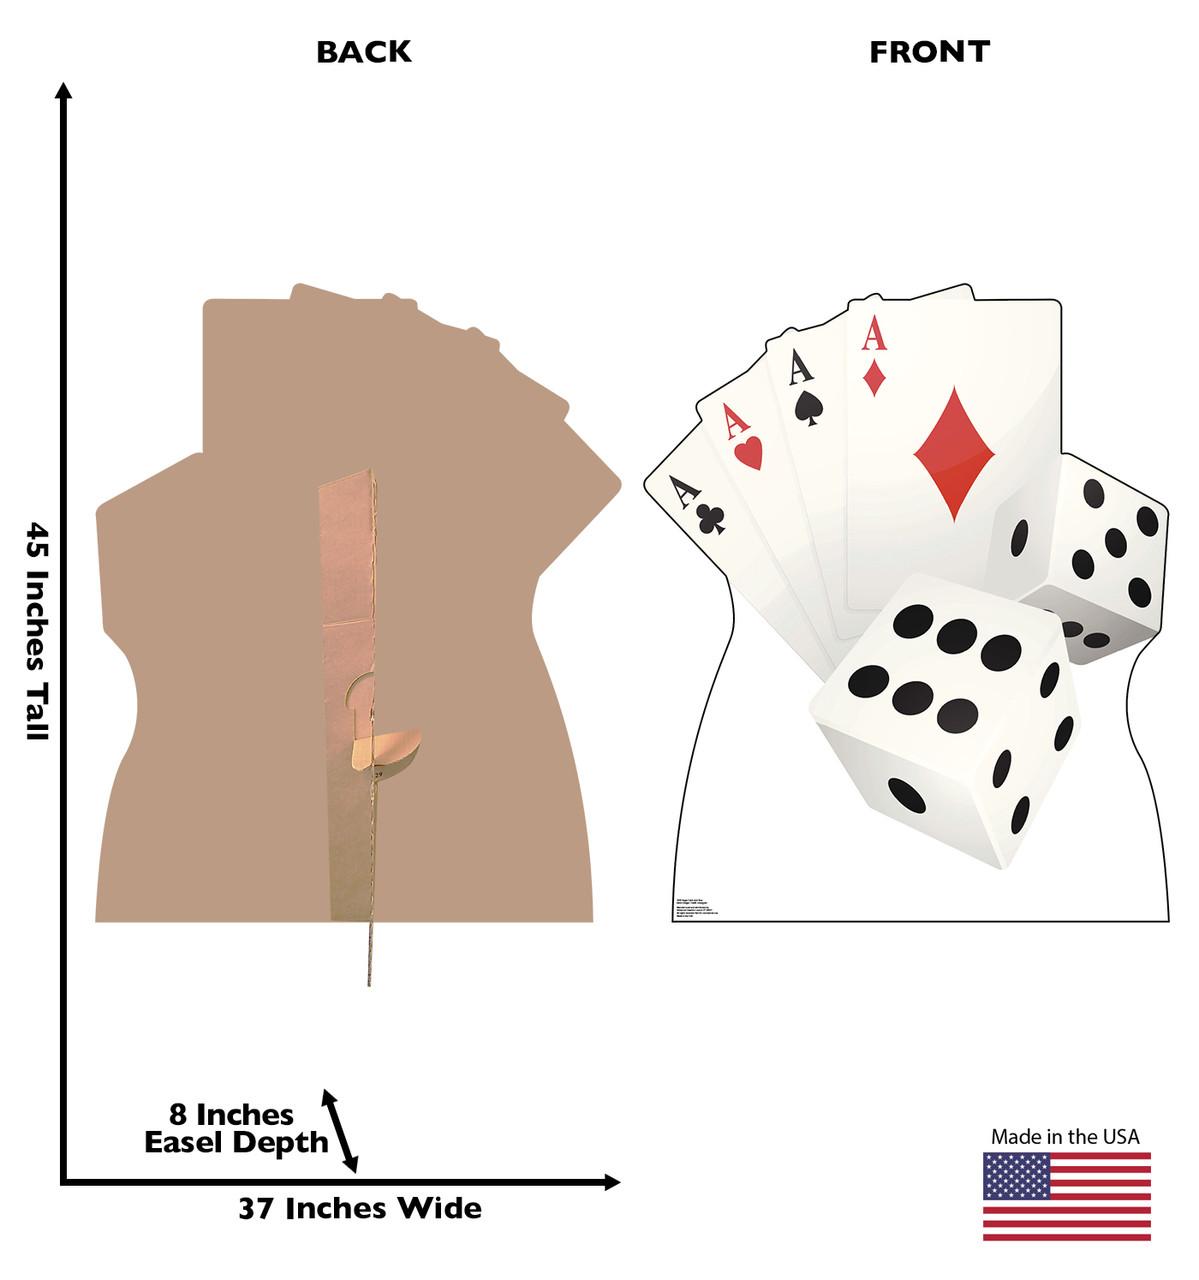 Life-size Vegas Cards and Dice Cardboard Standup | Cardboard Cutout